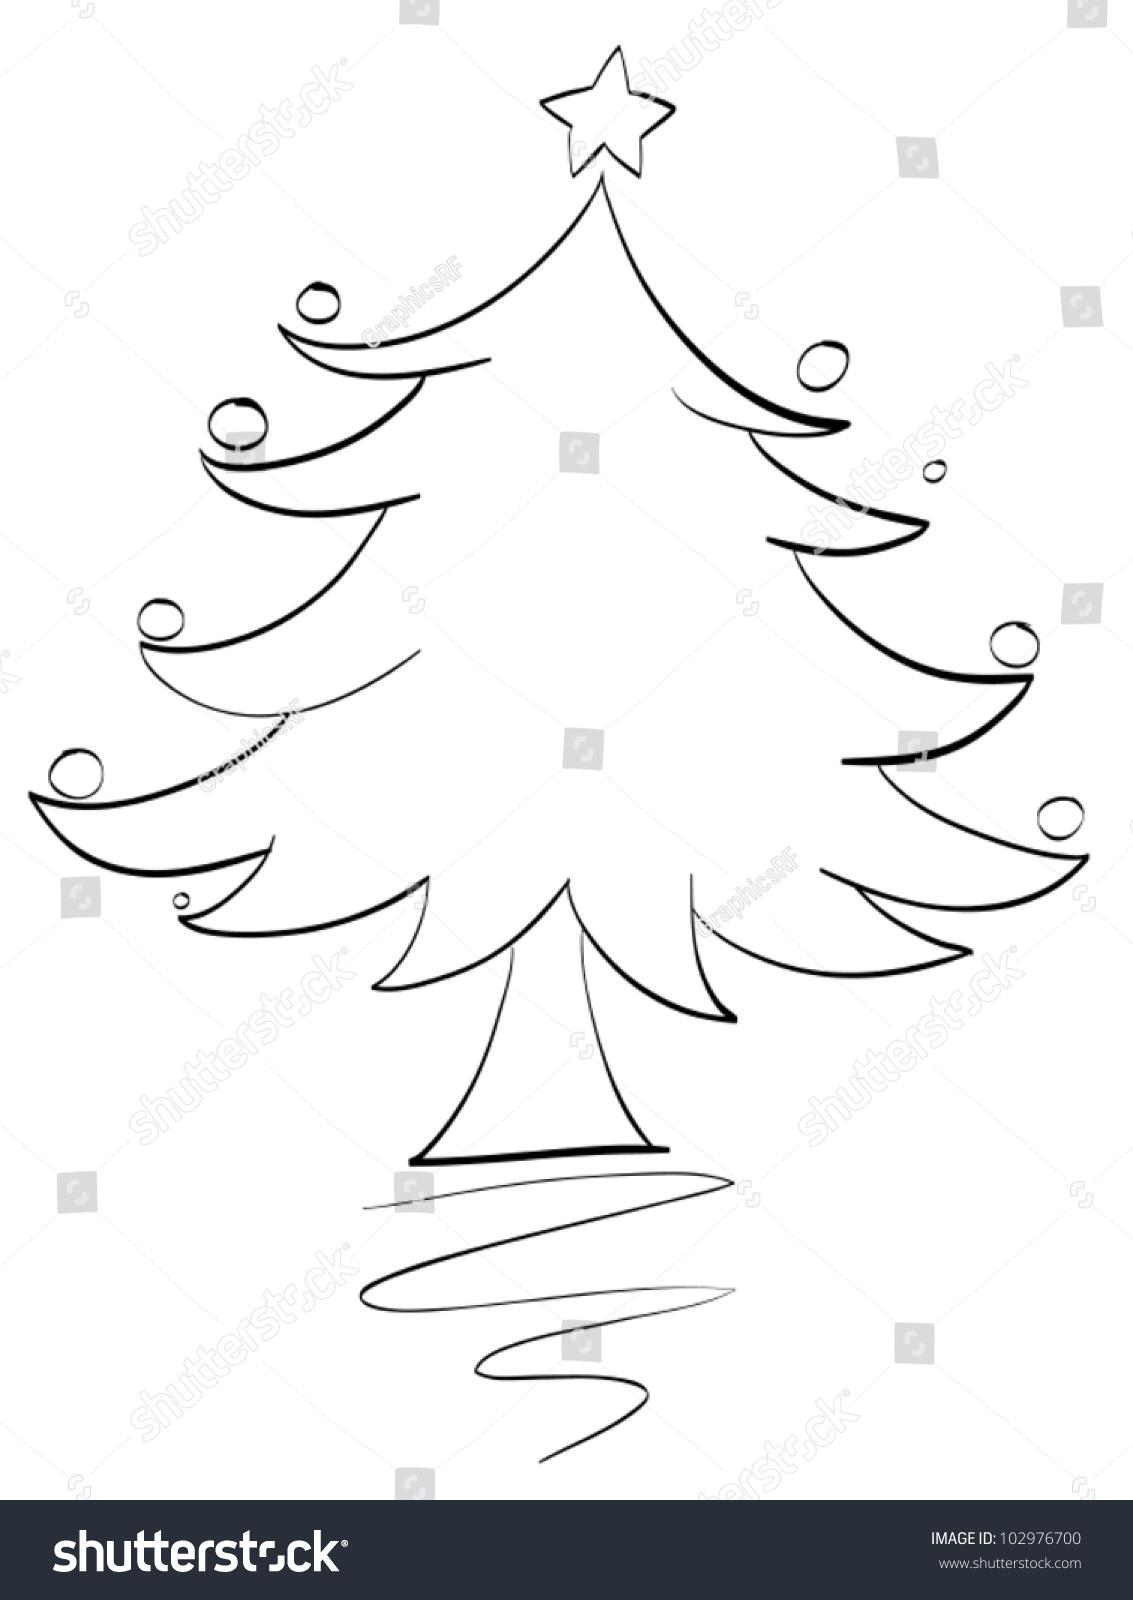 illustration xmas tree outline stock vector 102976700 shutterstock